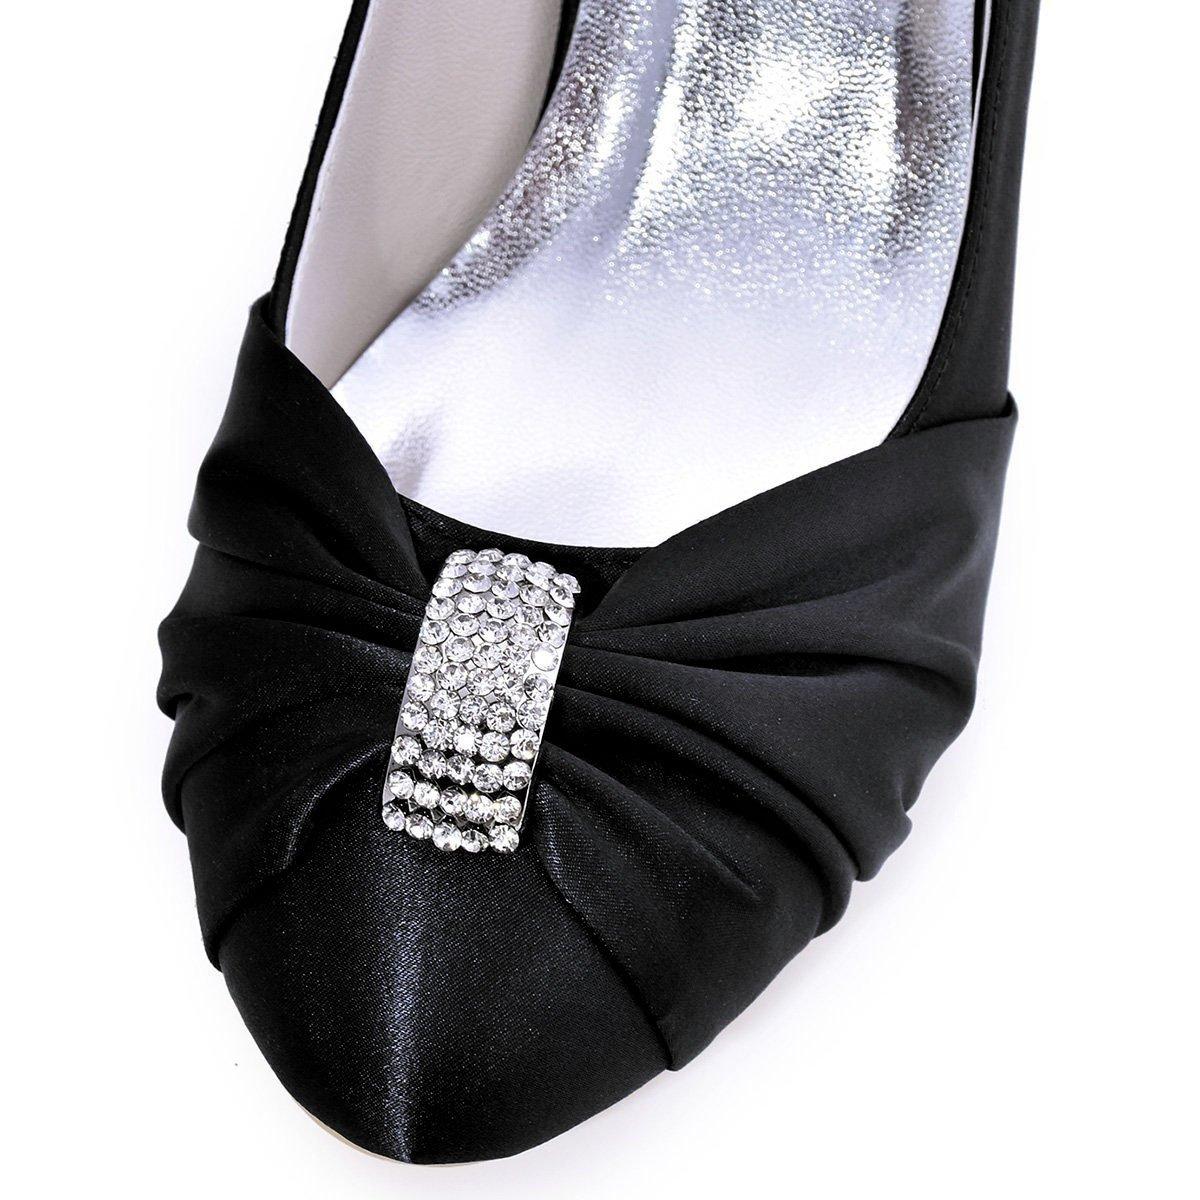 Elegantpark Women s Pumps Satin Rhinestones Closed Toe Mid Heel Wedding  Party Dress Court Shoes  Amazon.co.uk  Shoes   Bags 757fc6cbf048